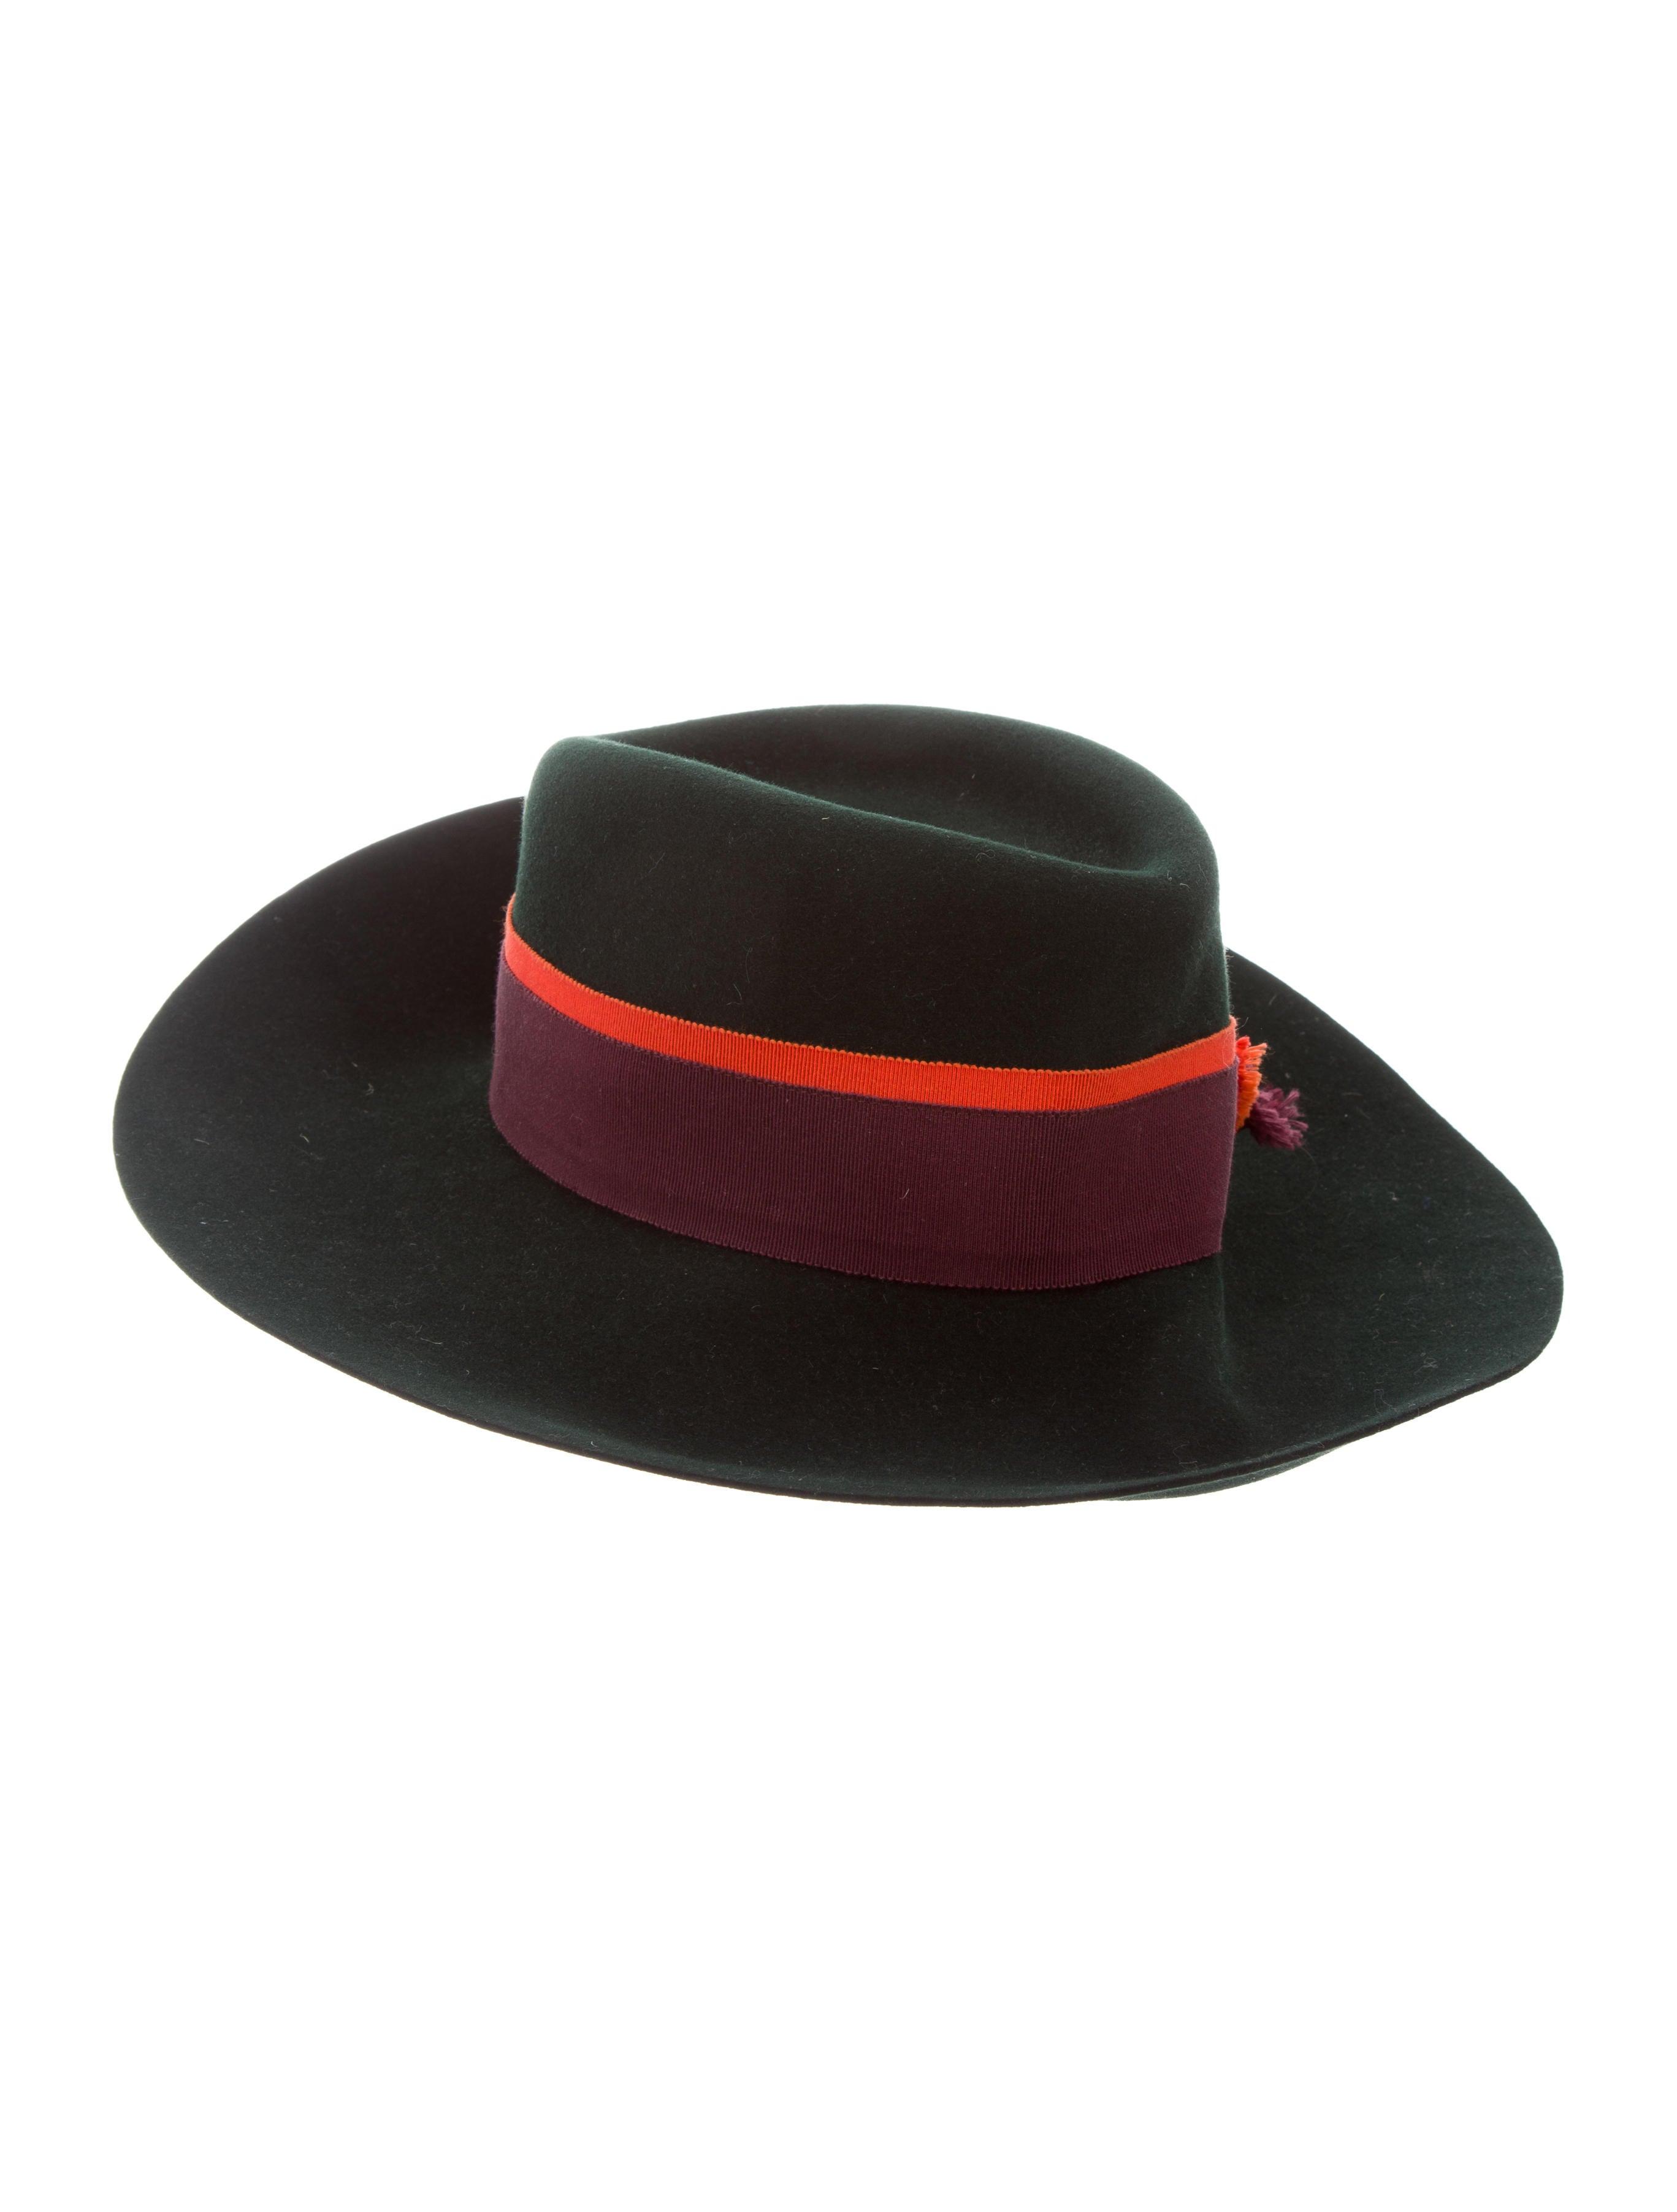 4c2e6b7cf49 Maison Michel Wide-Brim Felt Hat - Accessories - MSM20337